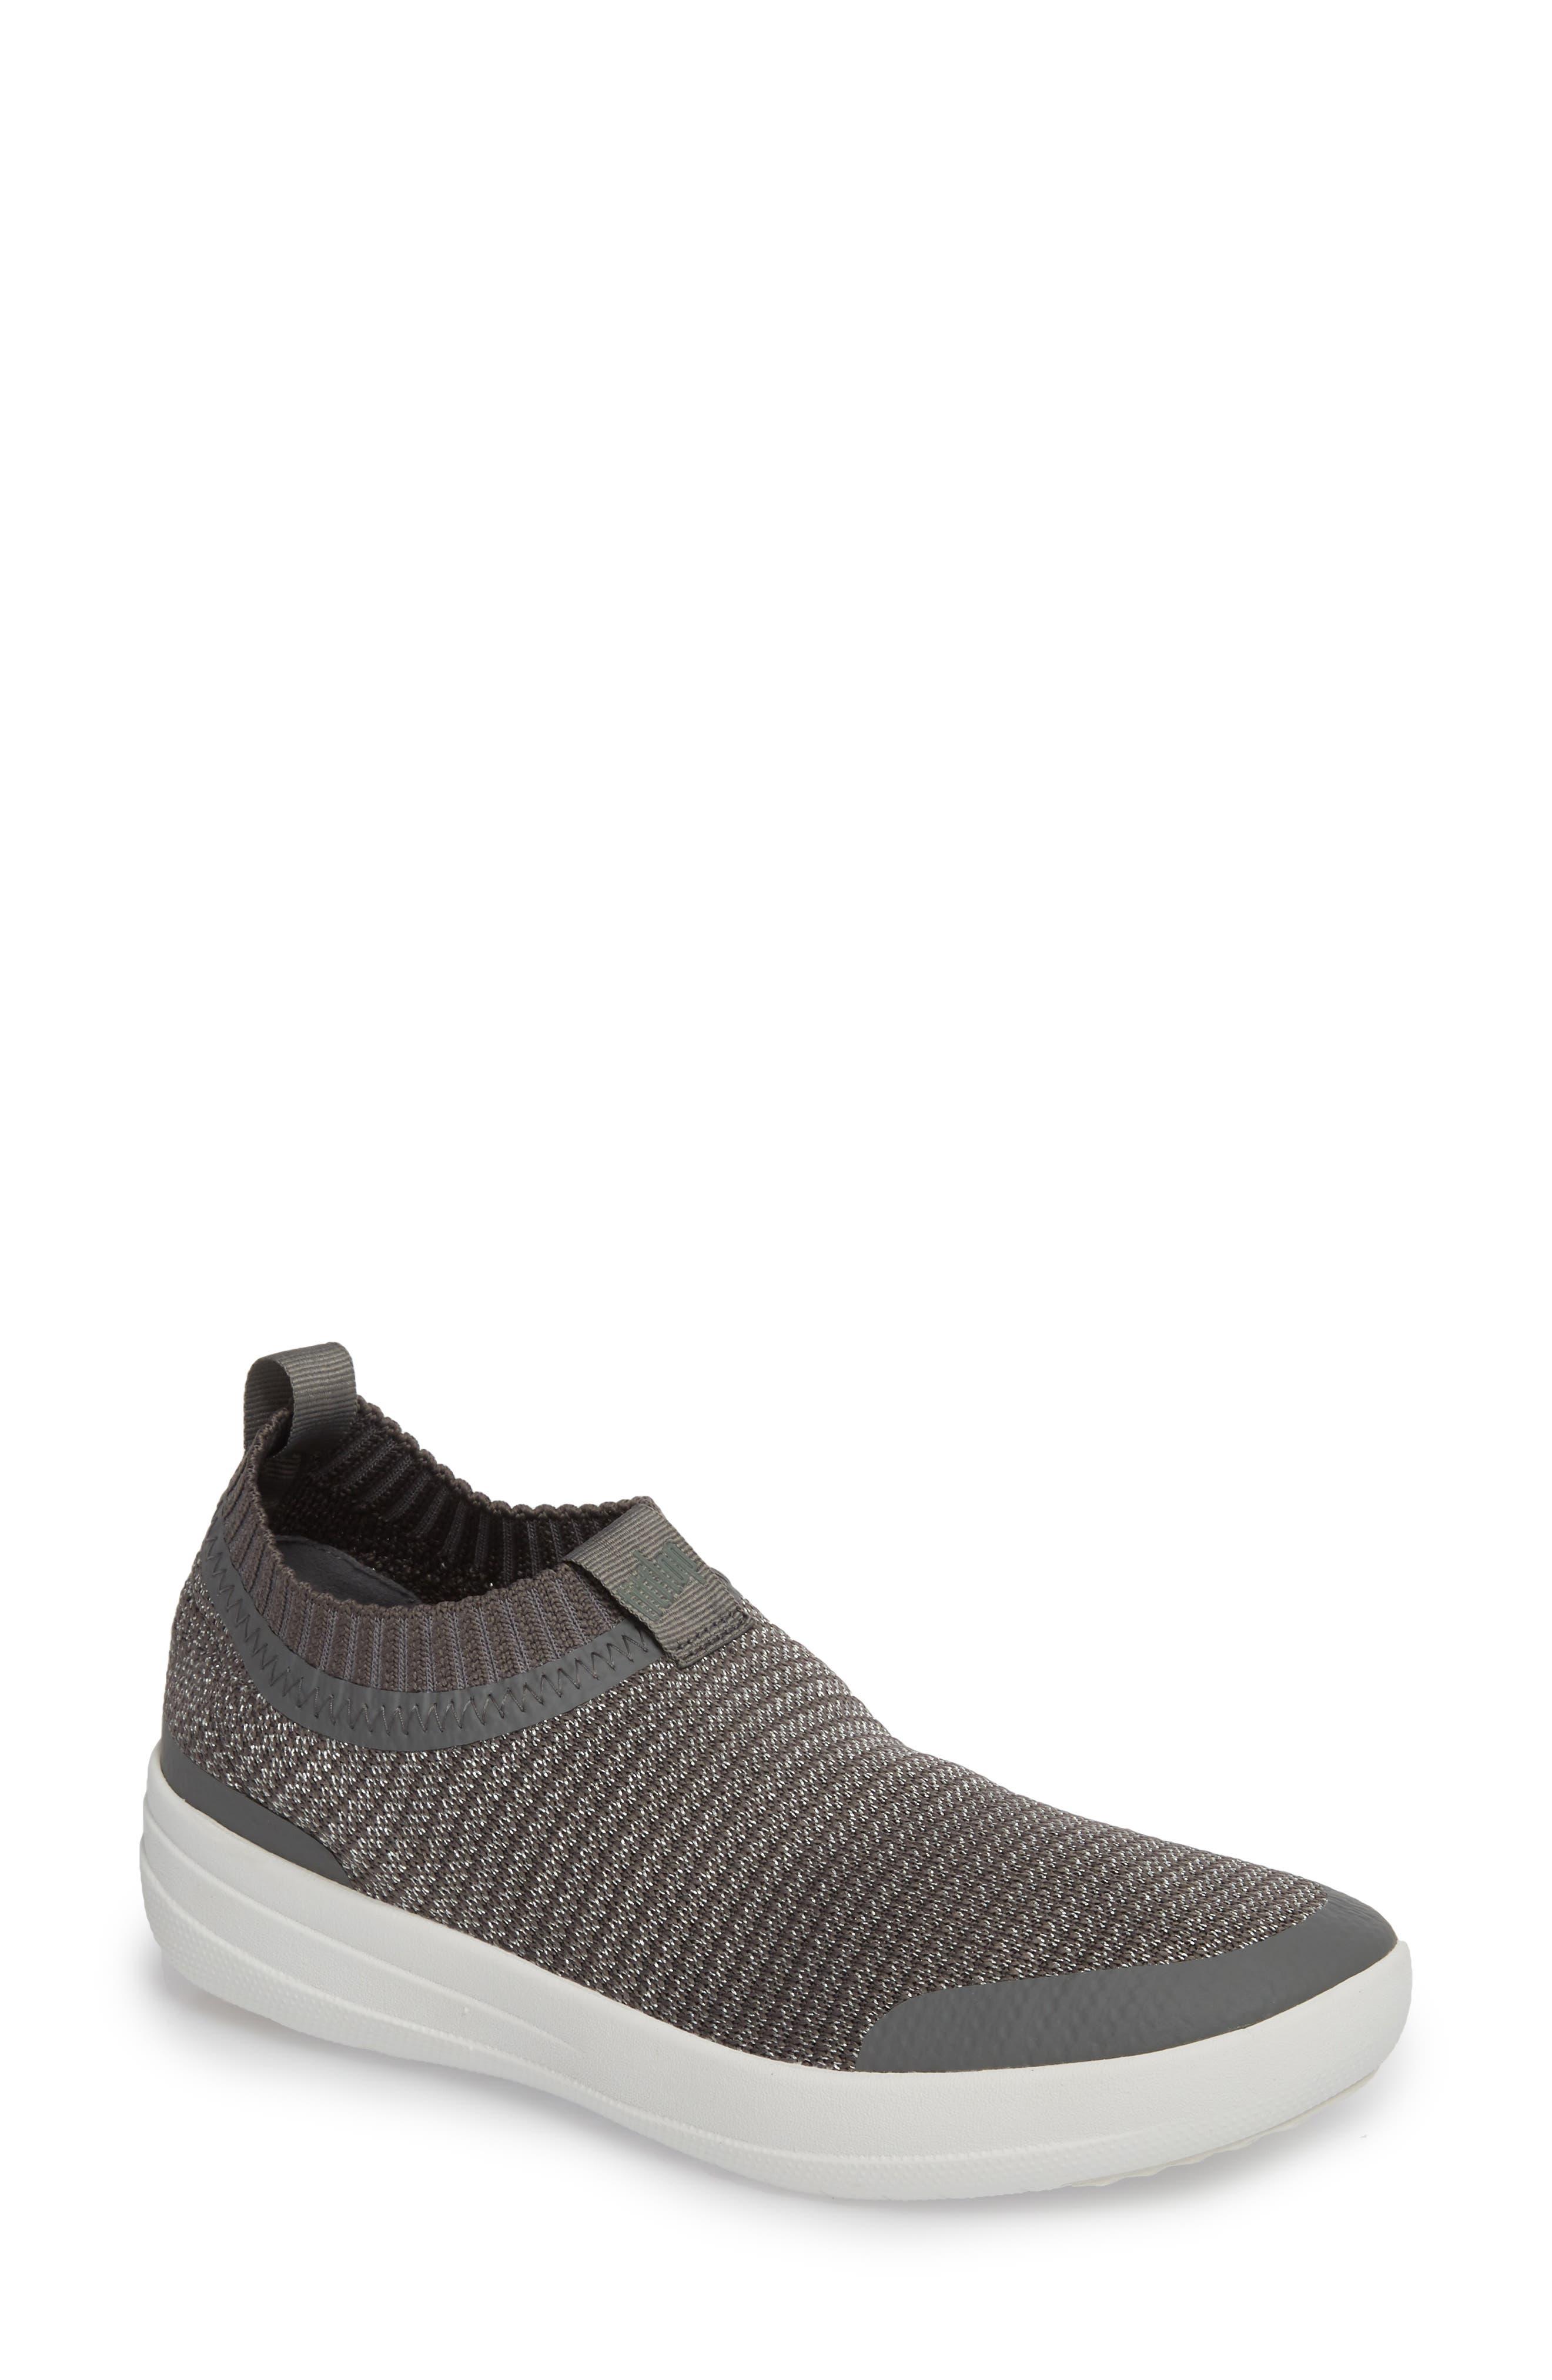 Uberknit Knit Sock Sneaker,                         Main,                         color, CHARCOAL/ METALLIC PEWTER